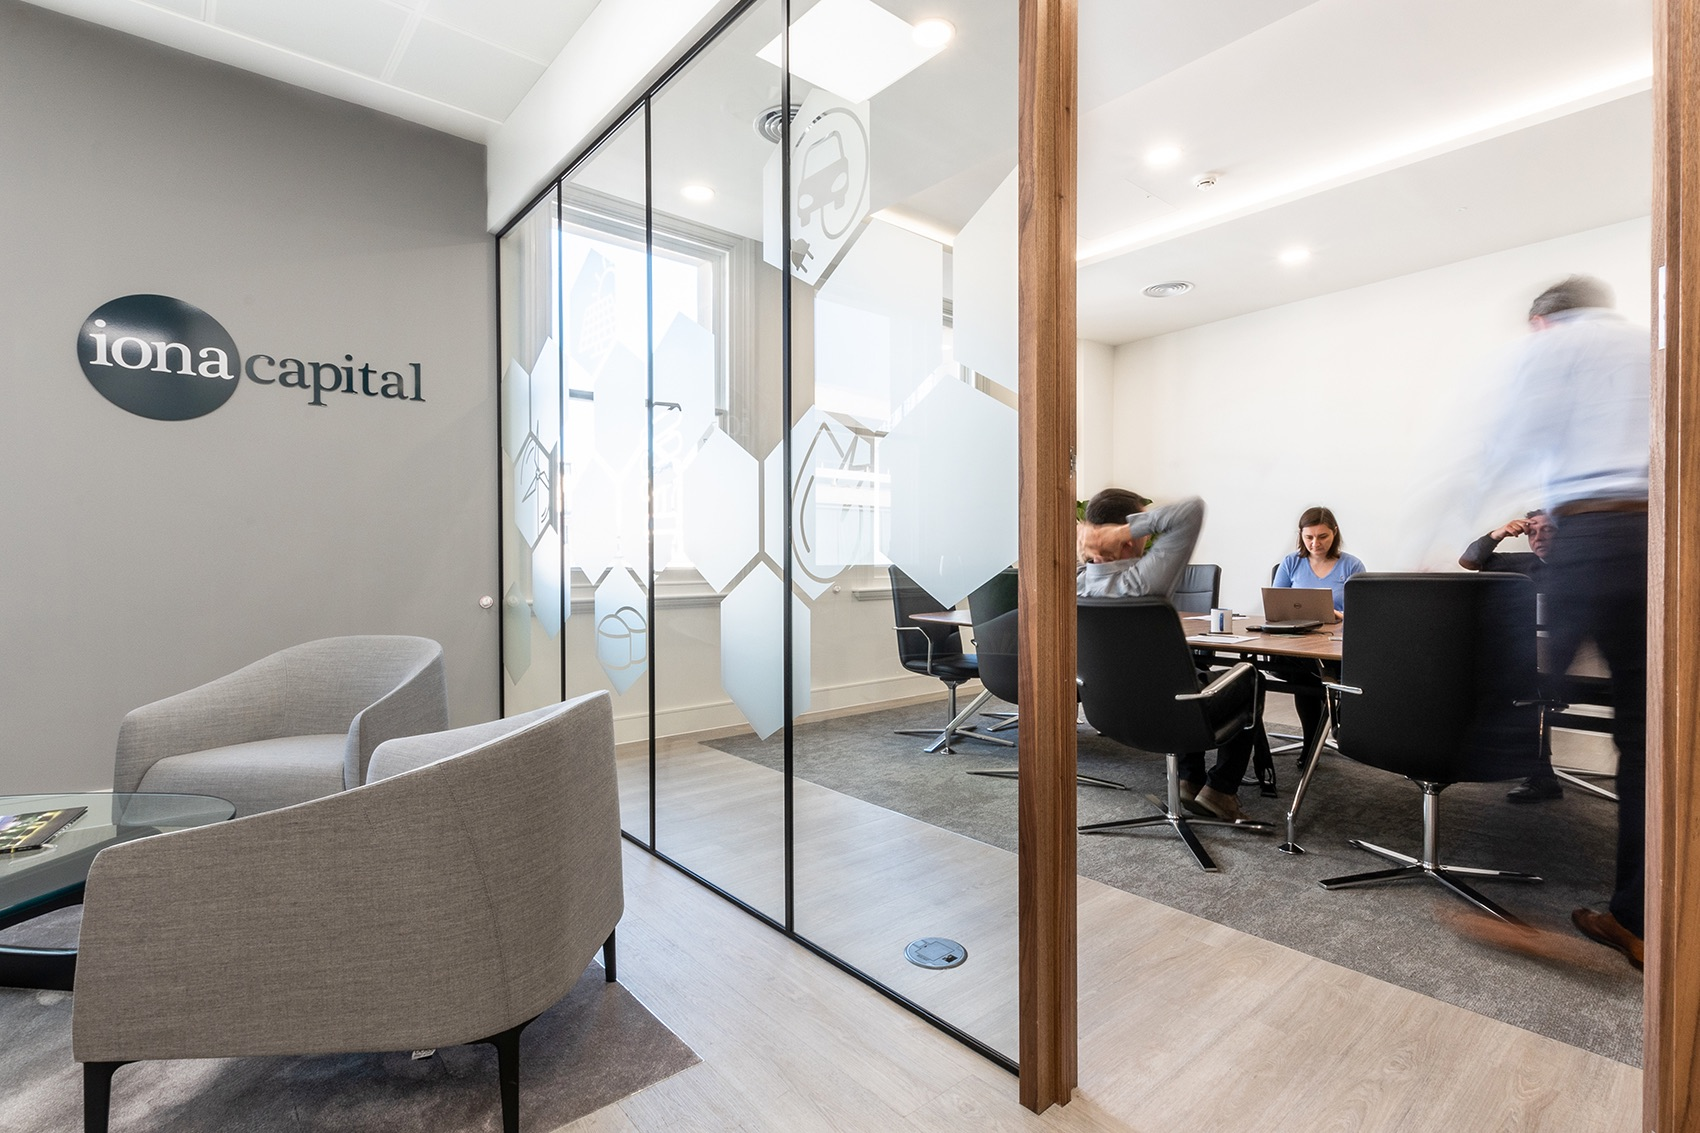 iona-capital-london-office-7